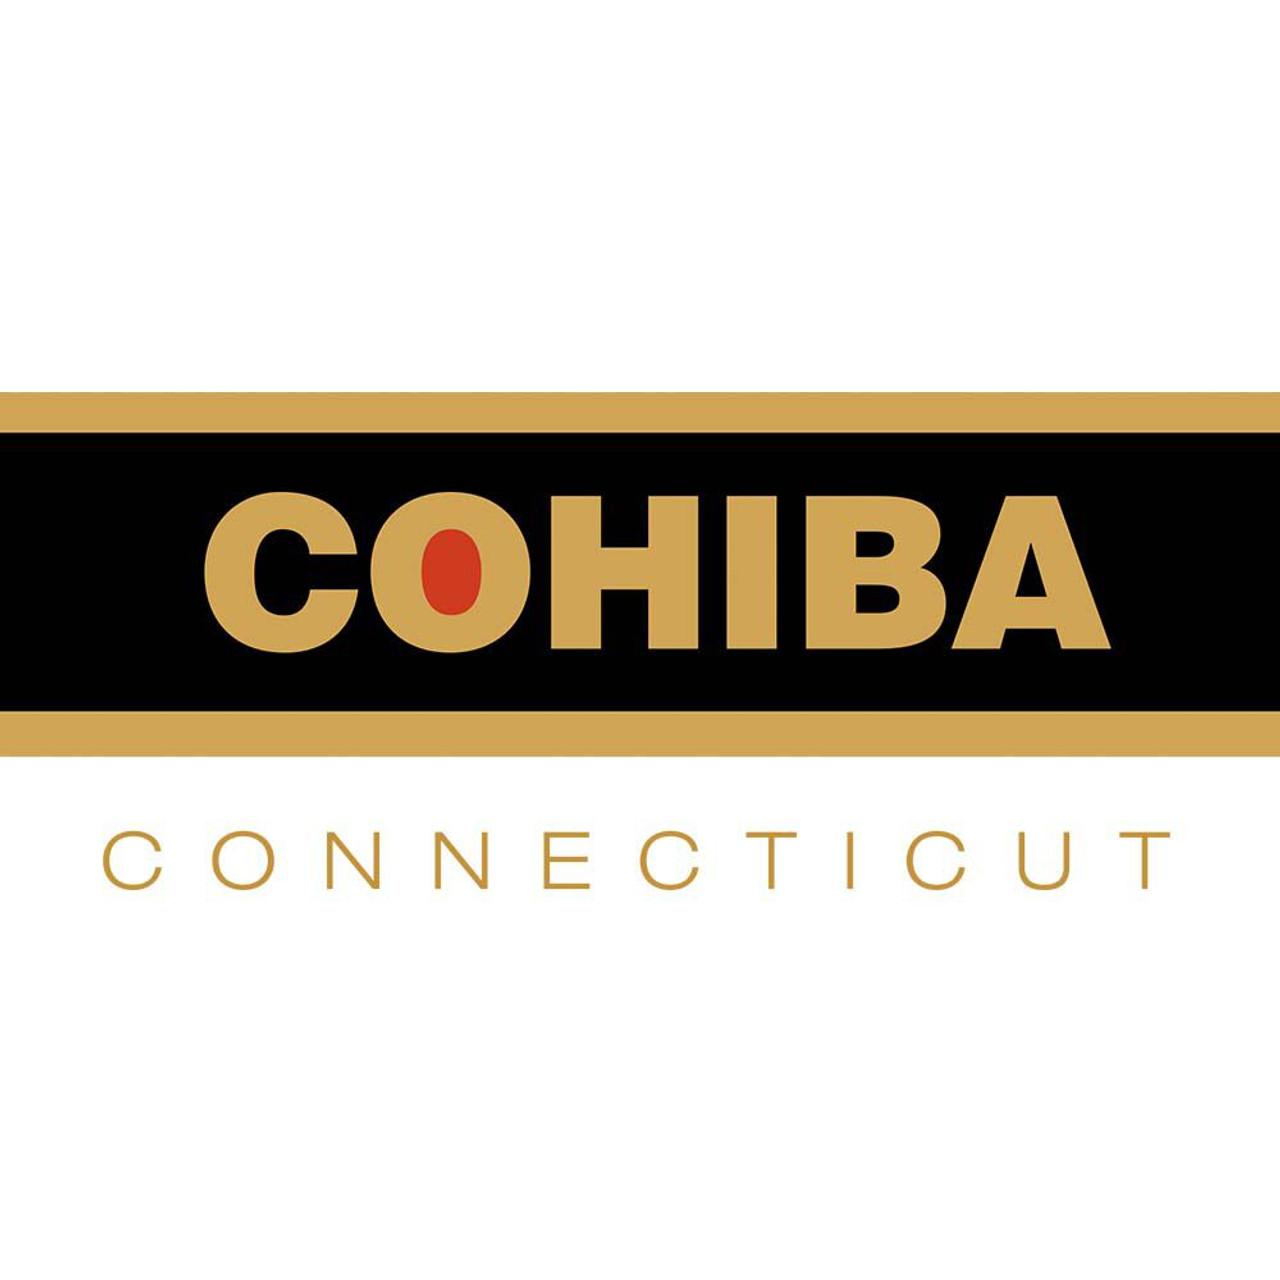 Cohiba Connecticut Gigante Cigars - 6.0 x 60 (Box of 20)